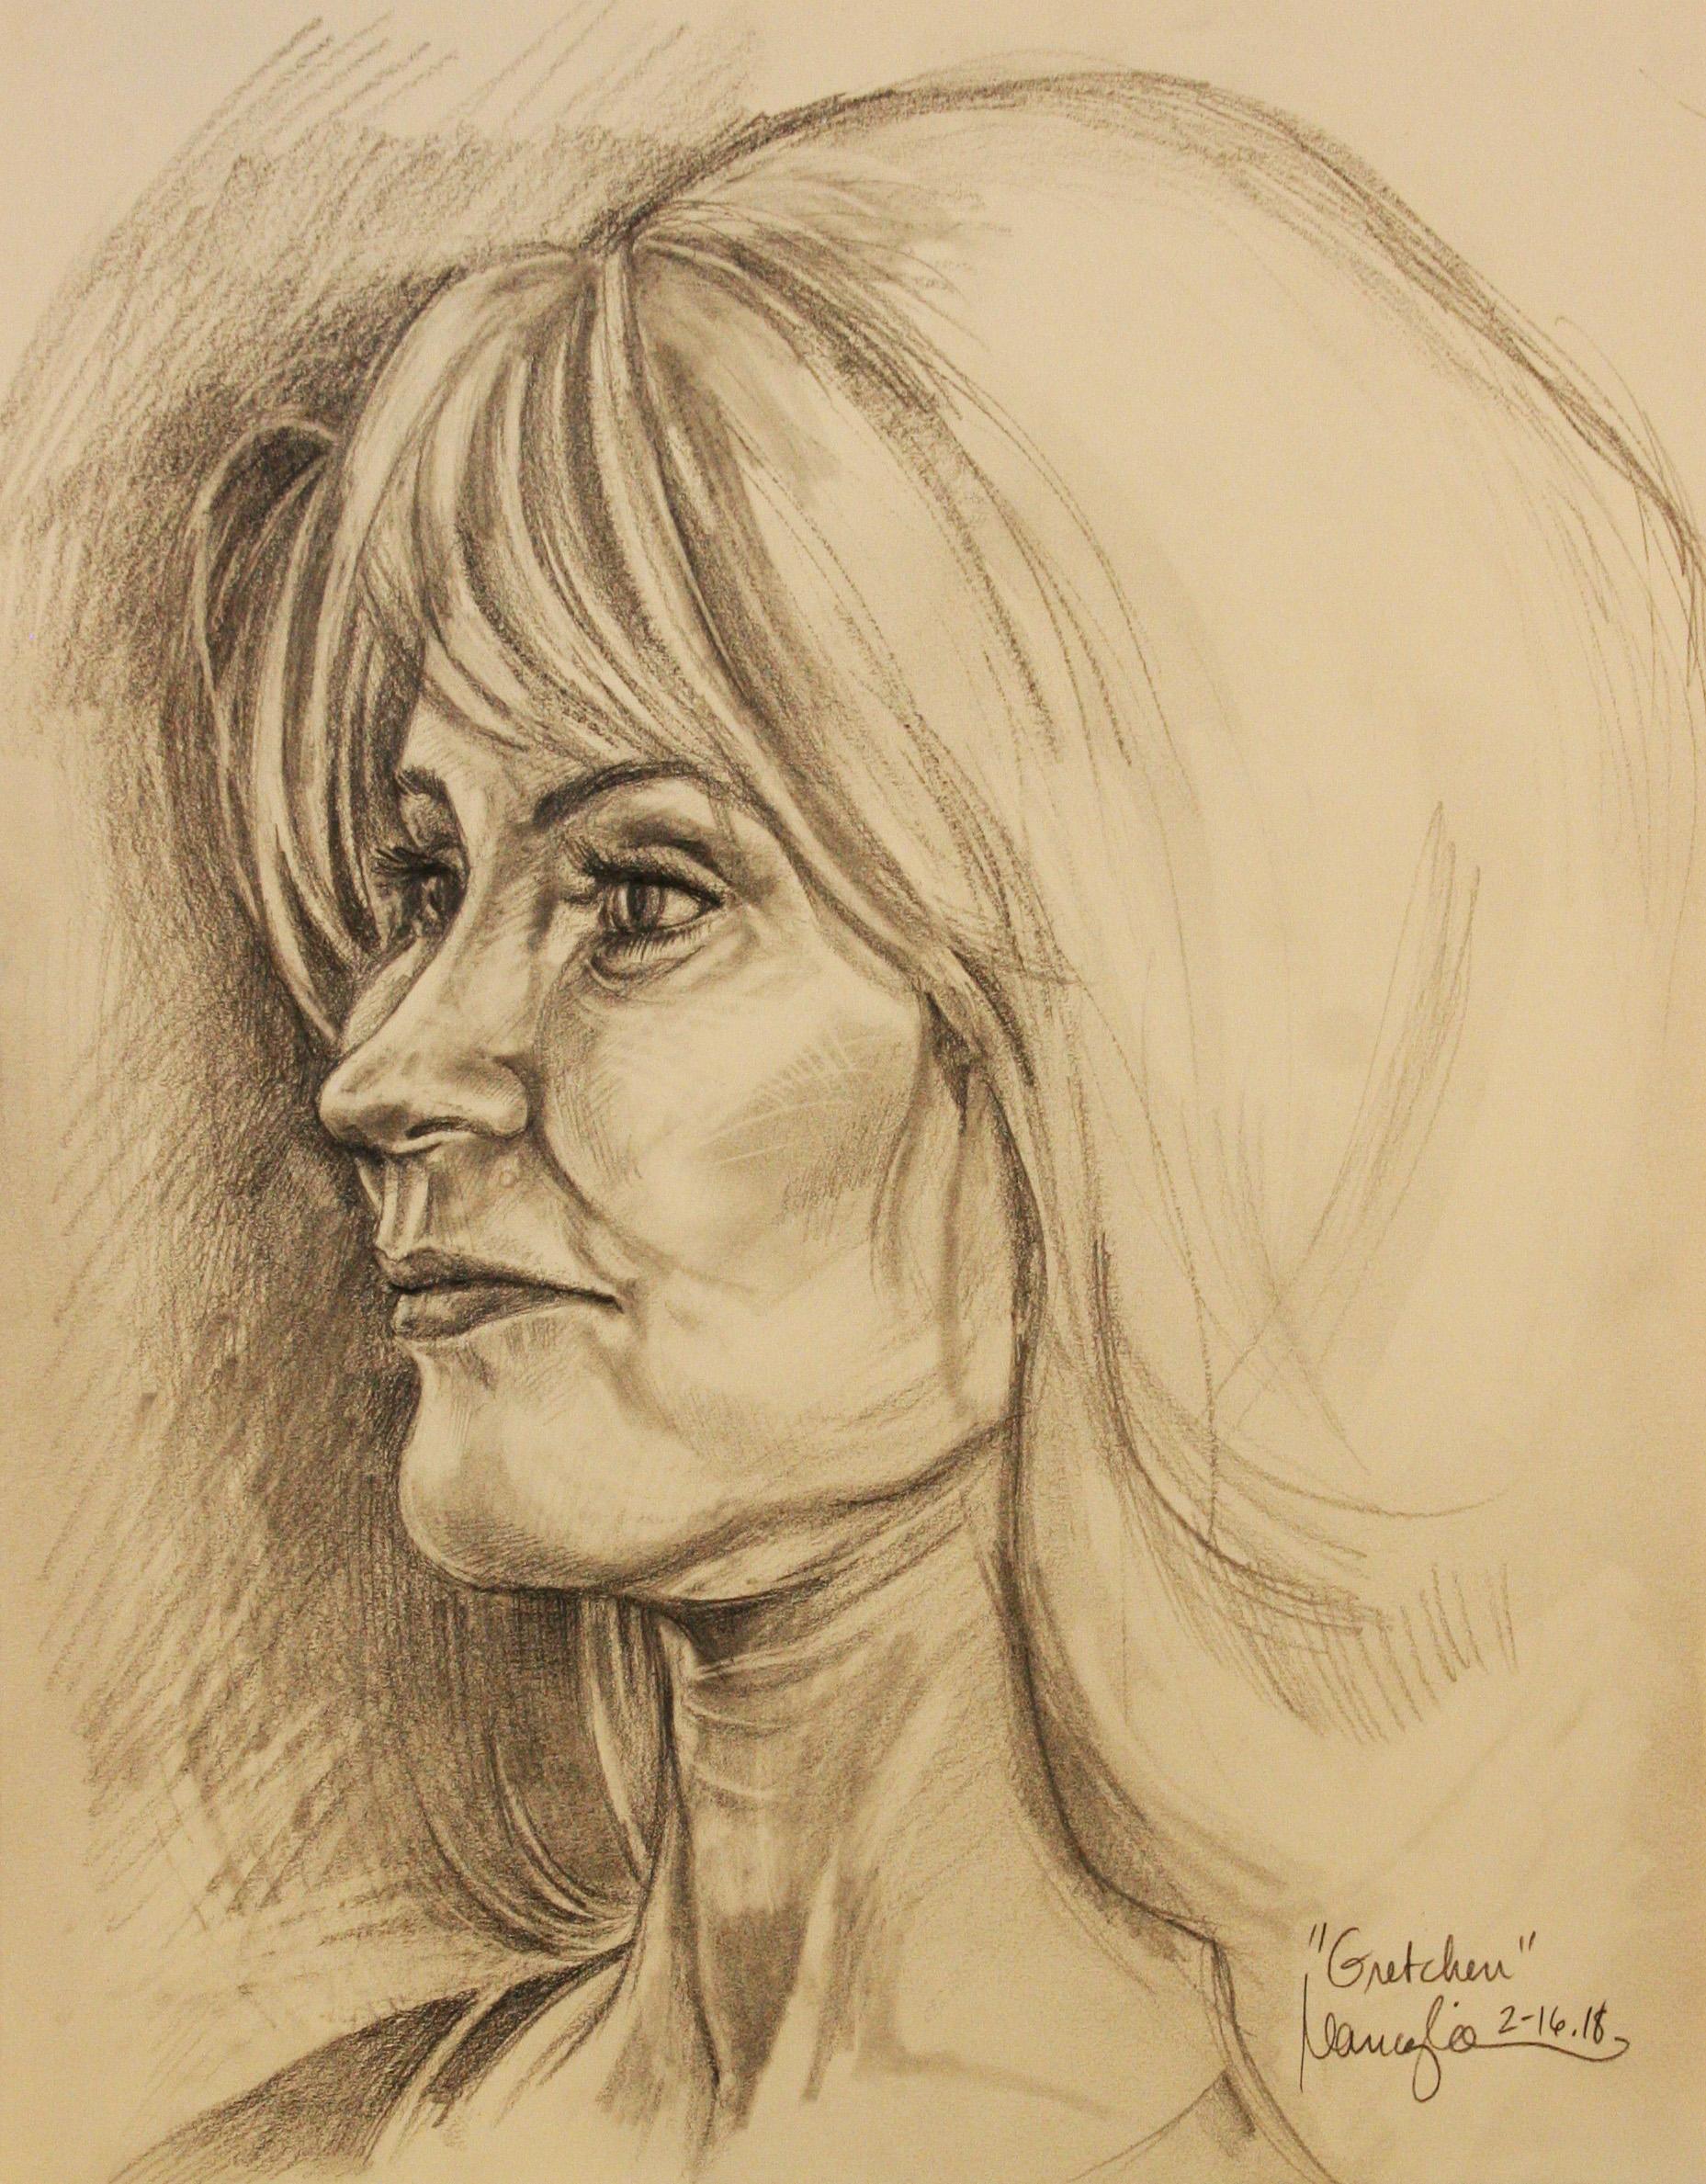 Nancy Lick did this drawing.